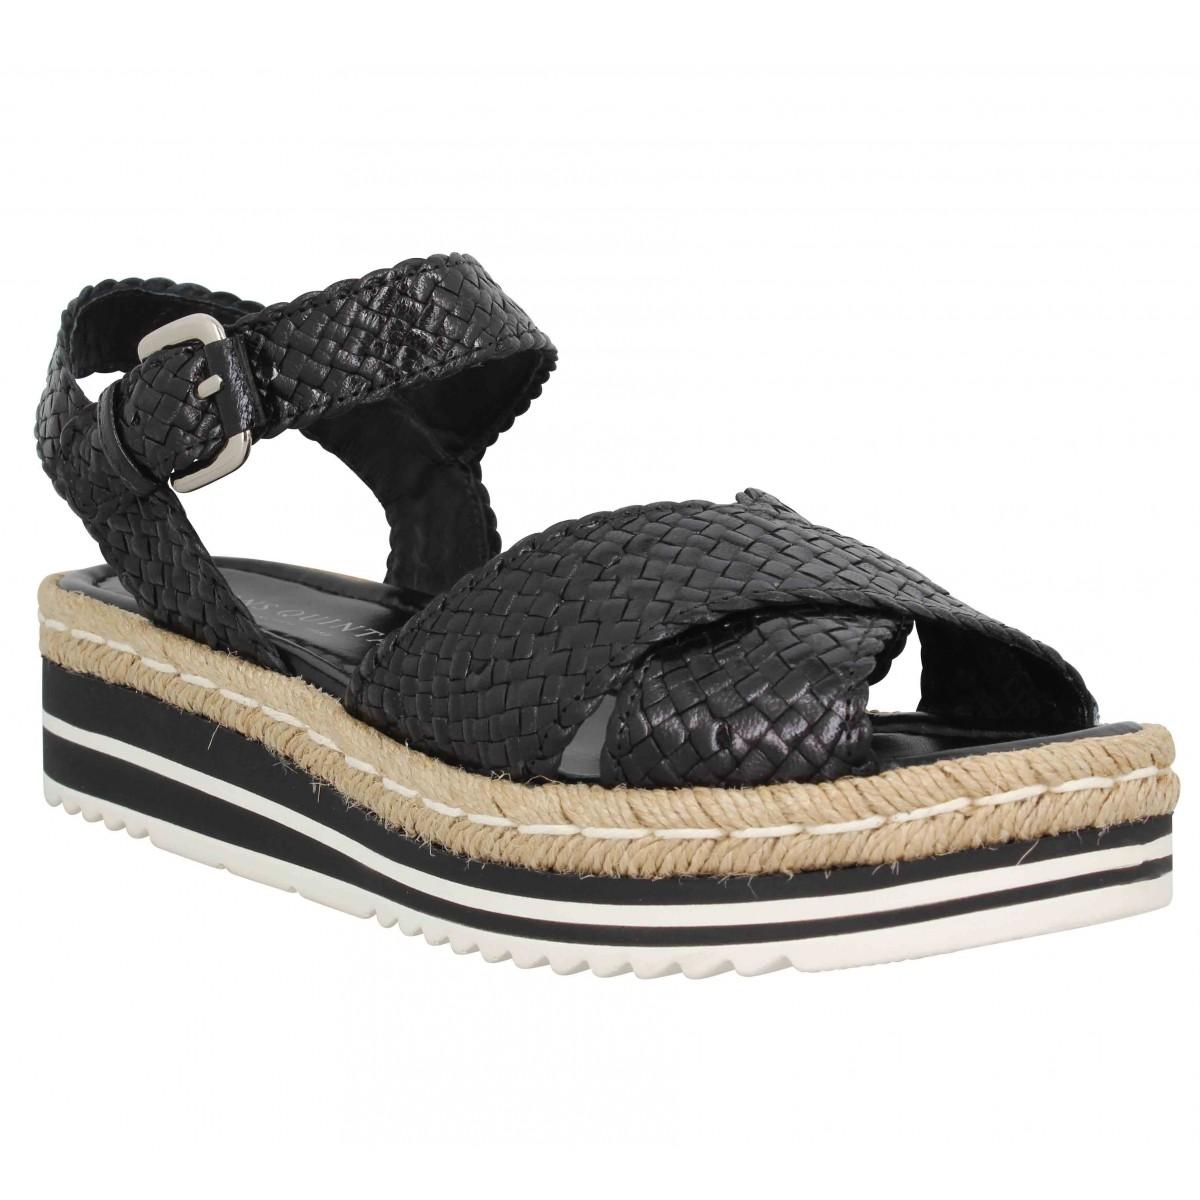 Nu-pieds PONS QUINTANA 7666 cuir Femme Noir